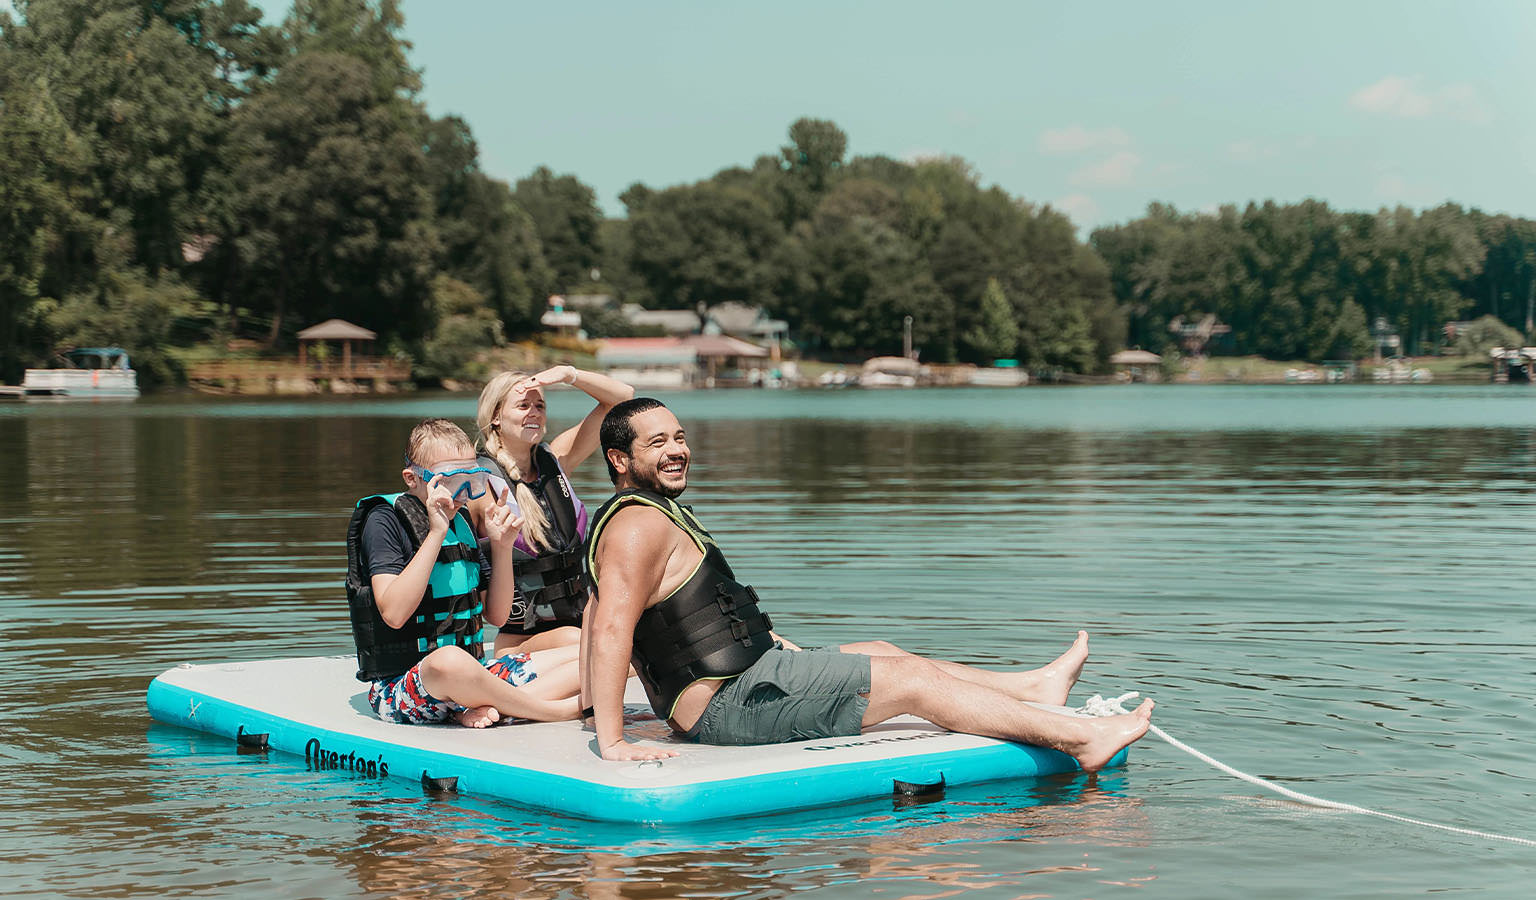 Save up to $300 on Lake & Pool Leisure